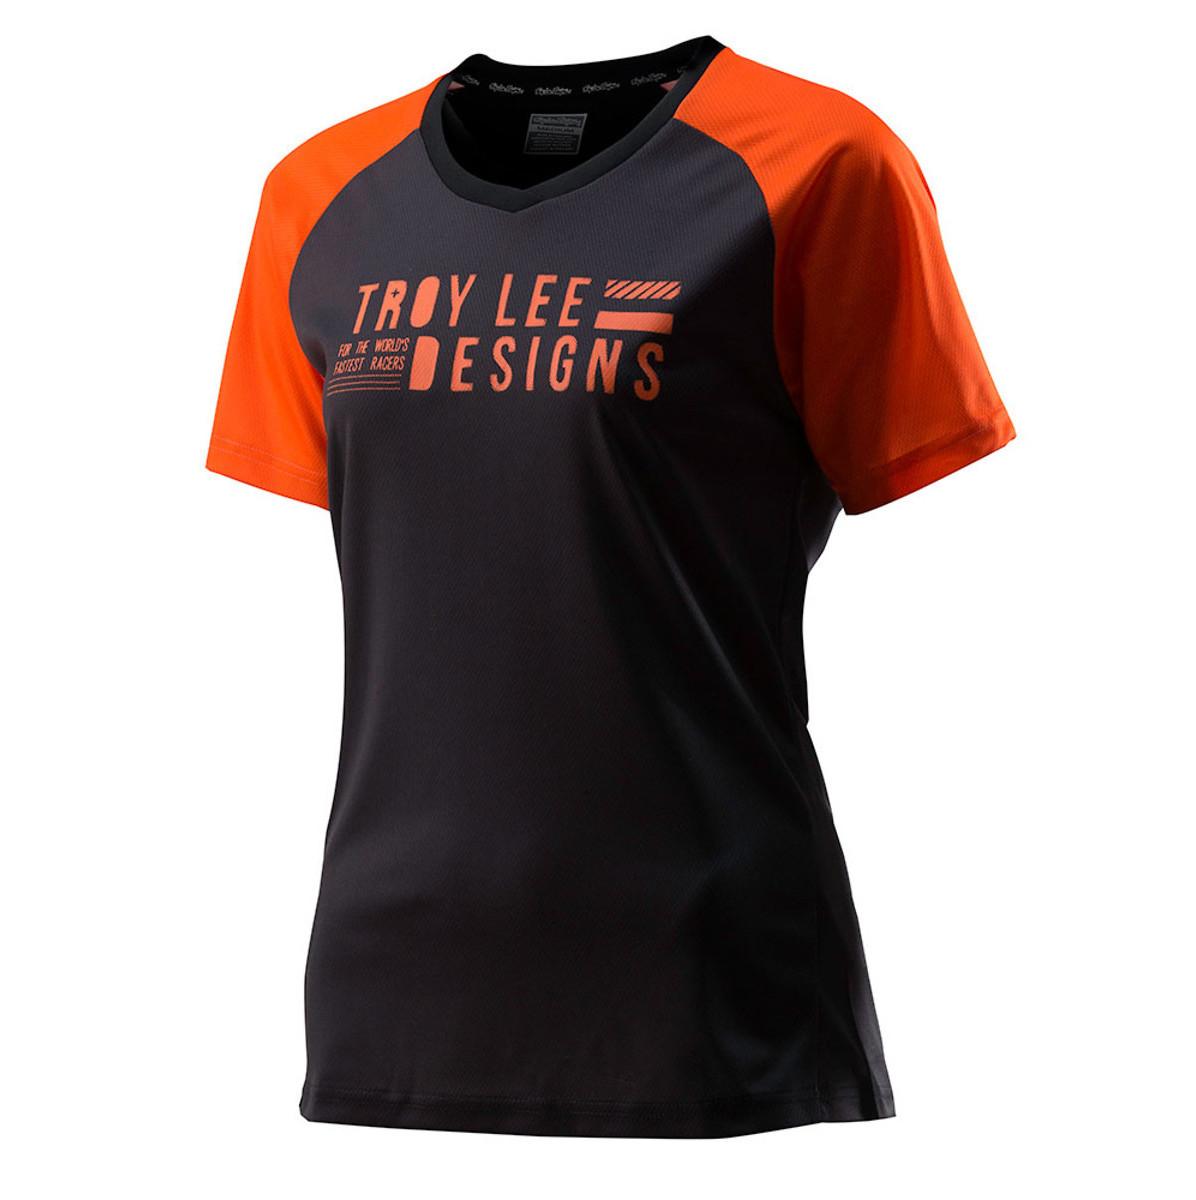 TLD Skyline Women's Jersey - Dark Gray:Orange